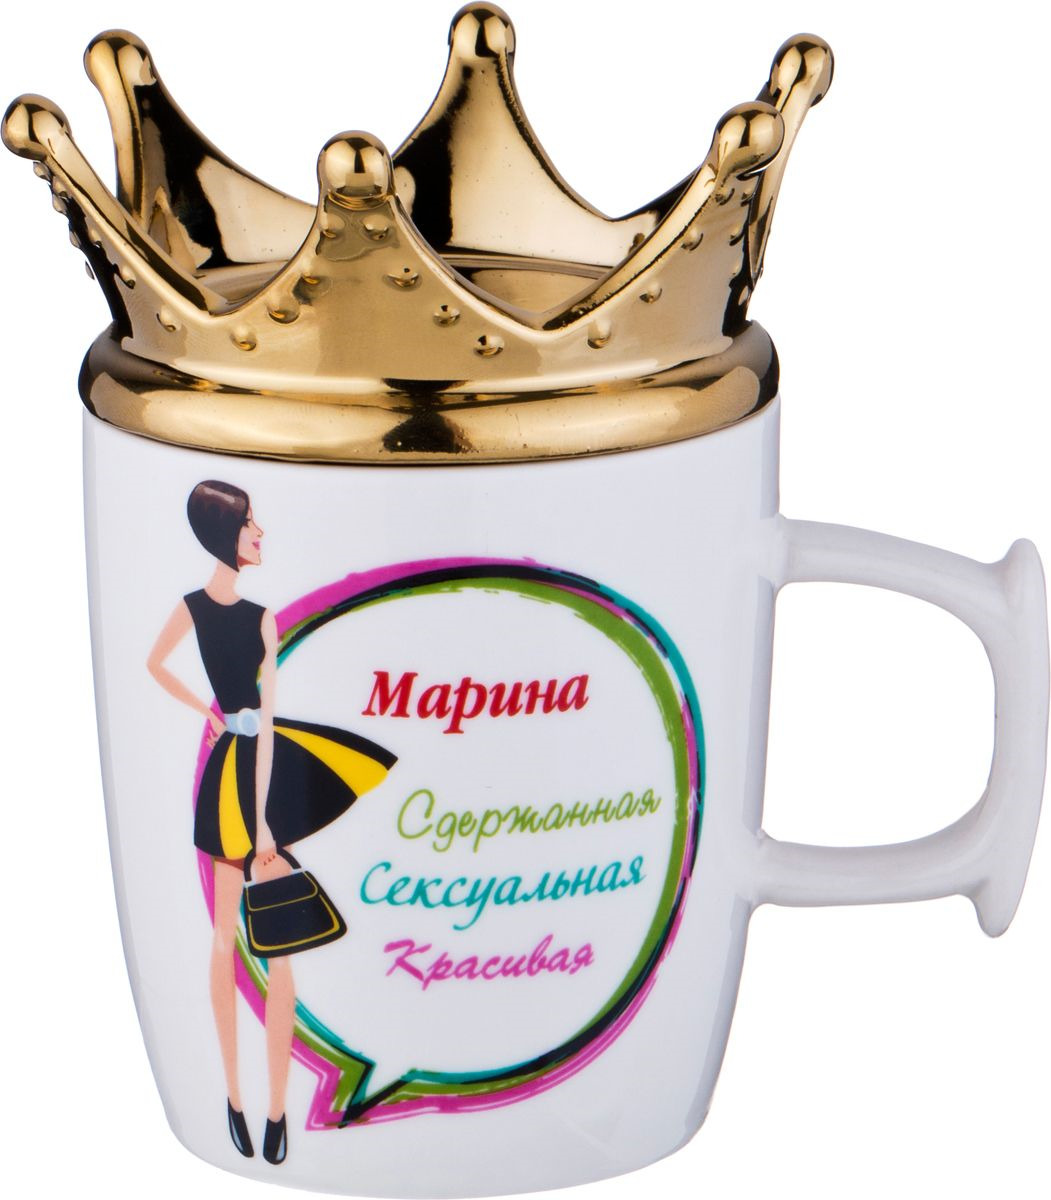 Кружка столовая Lefard Марина-королева, 383-696, мультиколор, 300 мл